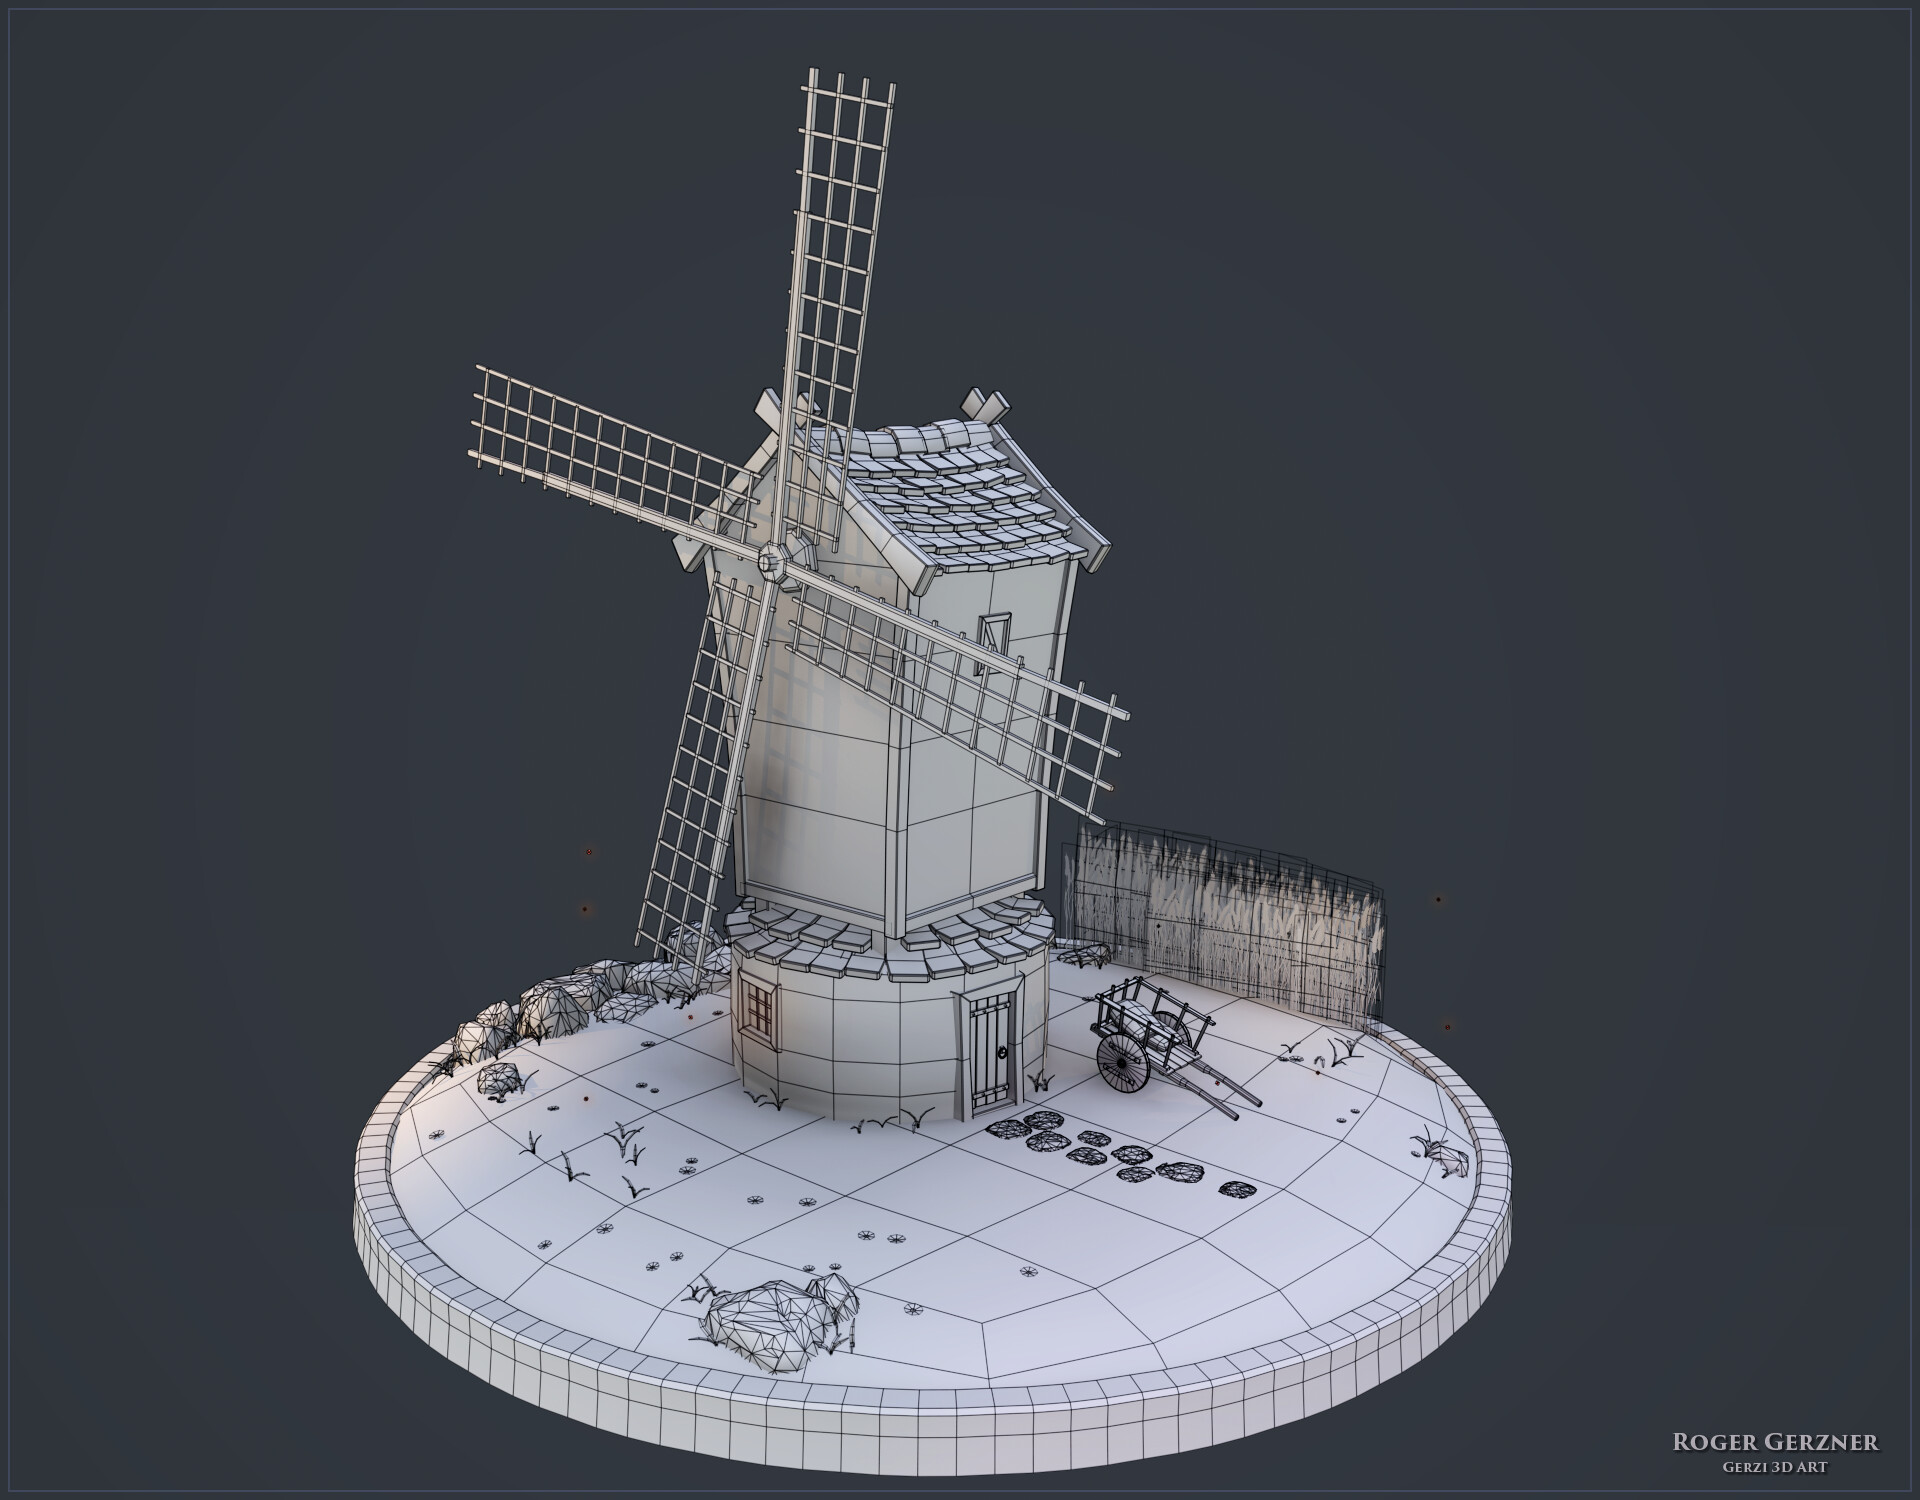 Roger gerzner rogergerzner windmill 05